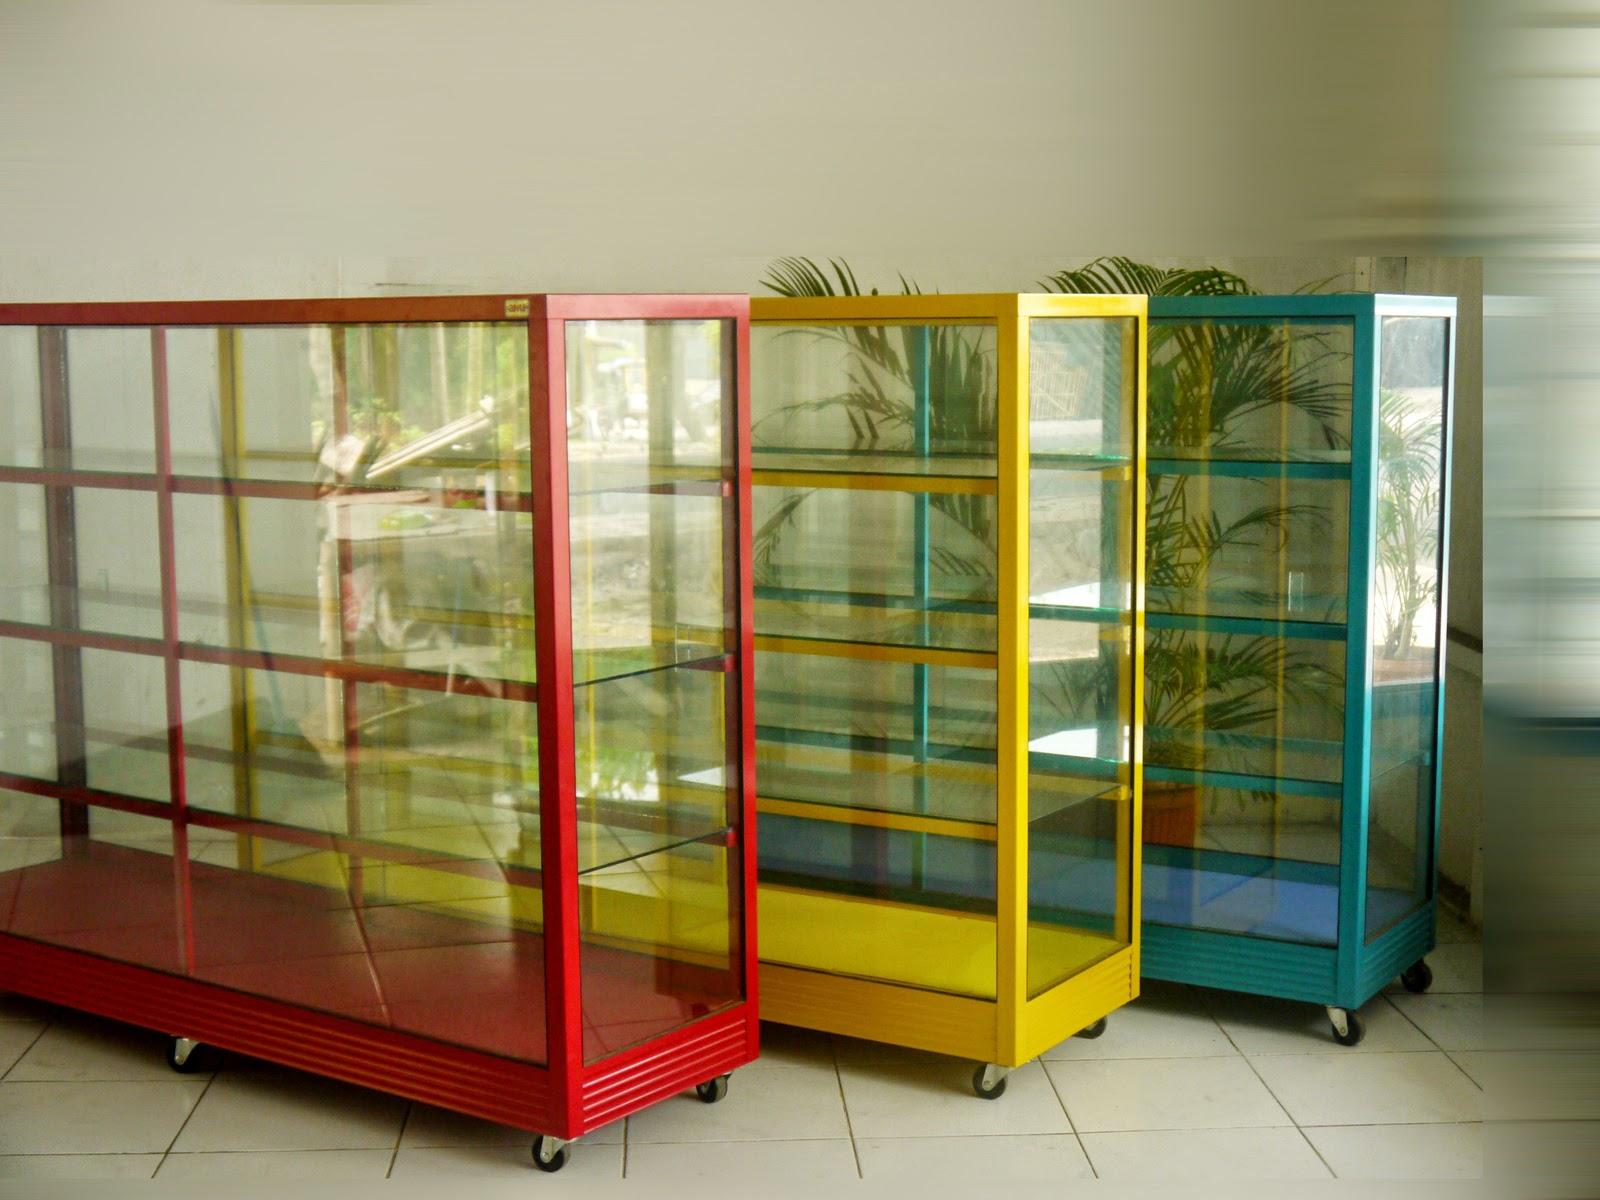 23 Model Dan Harga Etalase Kaca Alumunium Lengkap Dengan Gambarnya Rak Dinding Dapur Toko Sembako